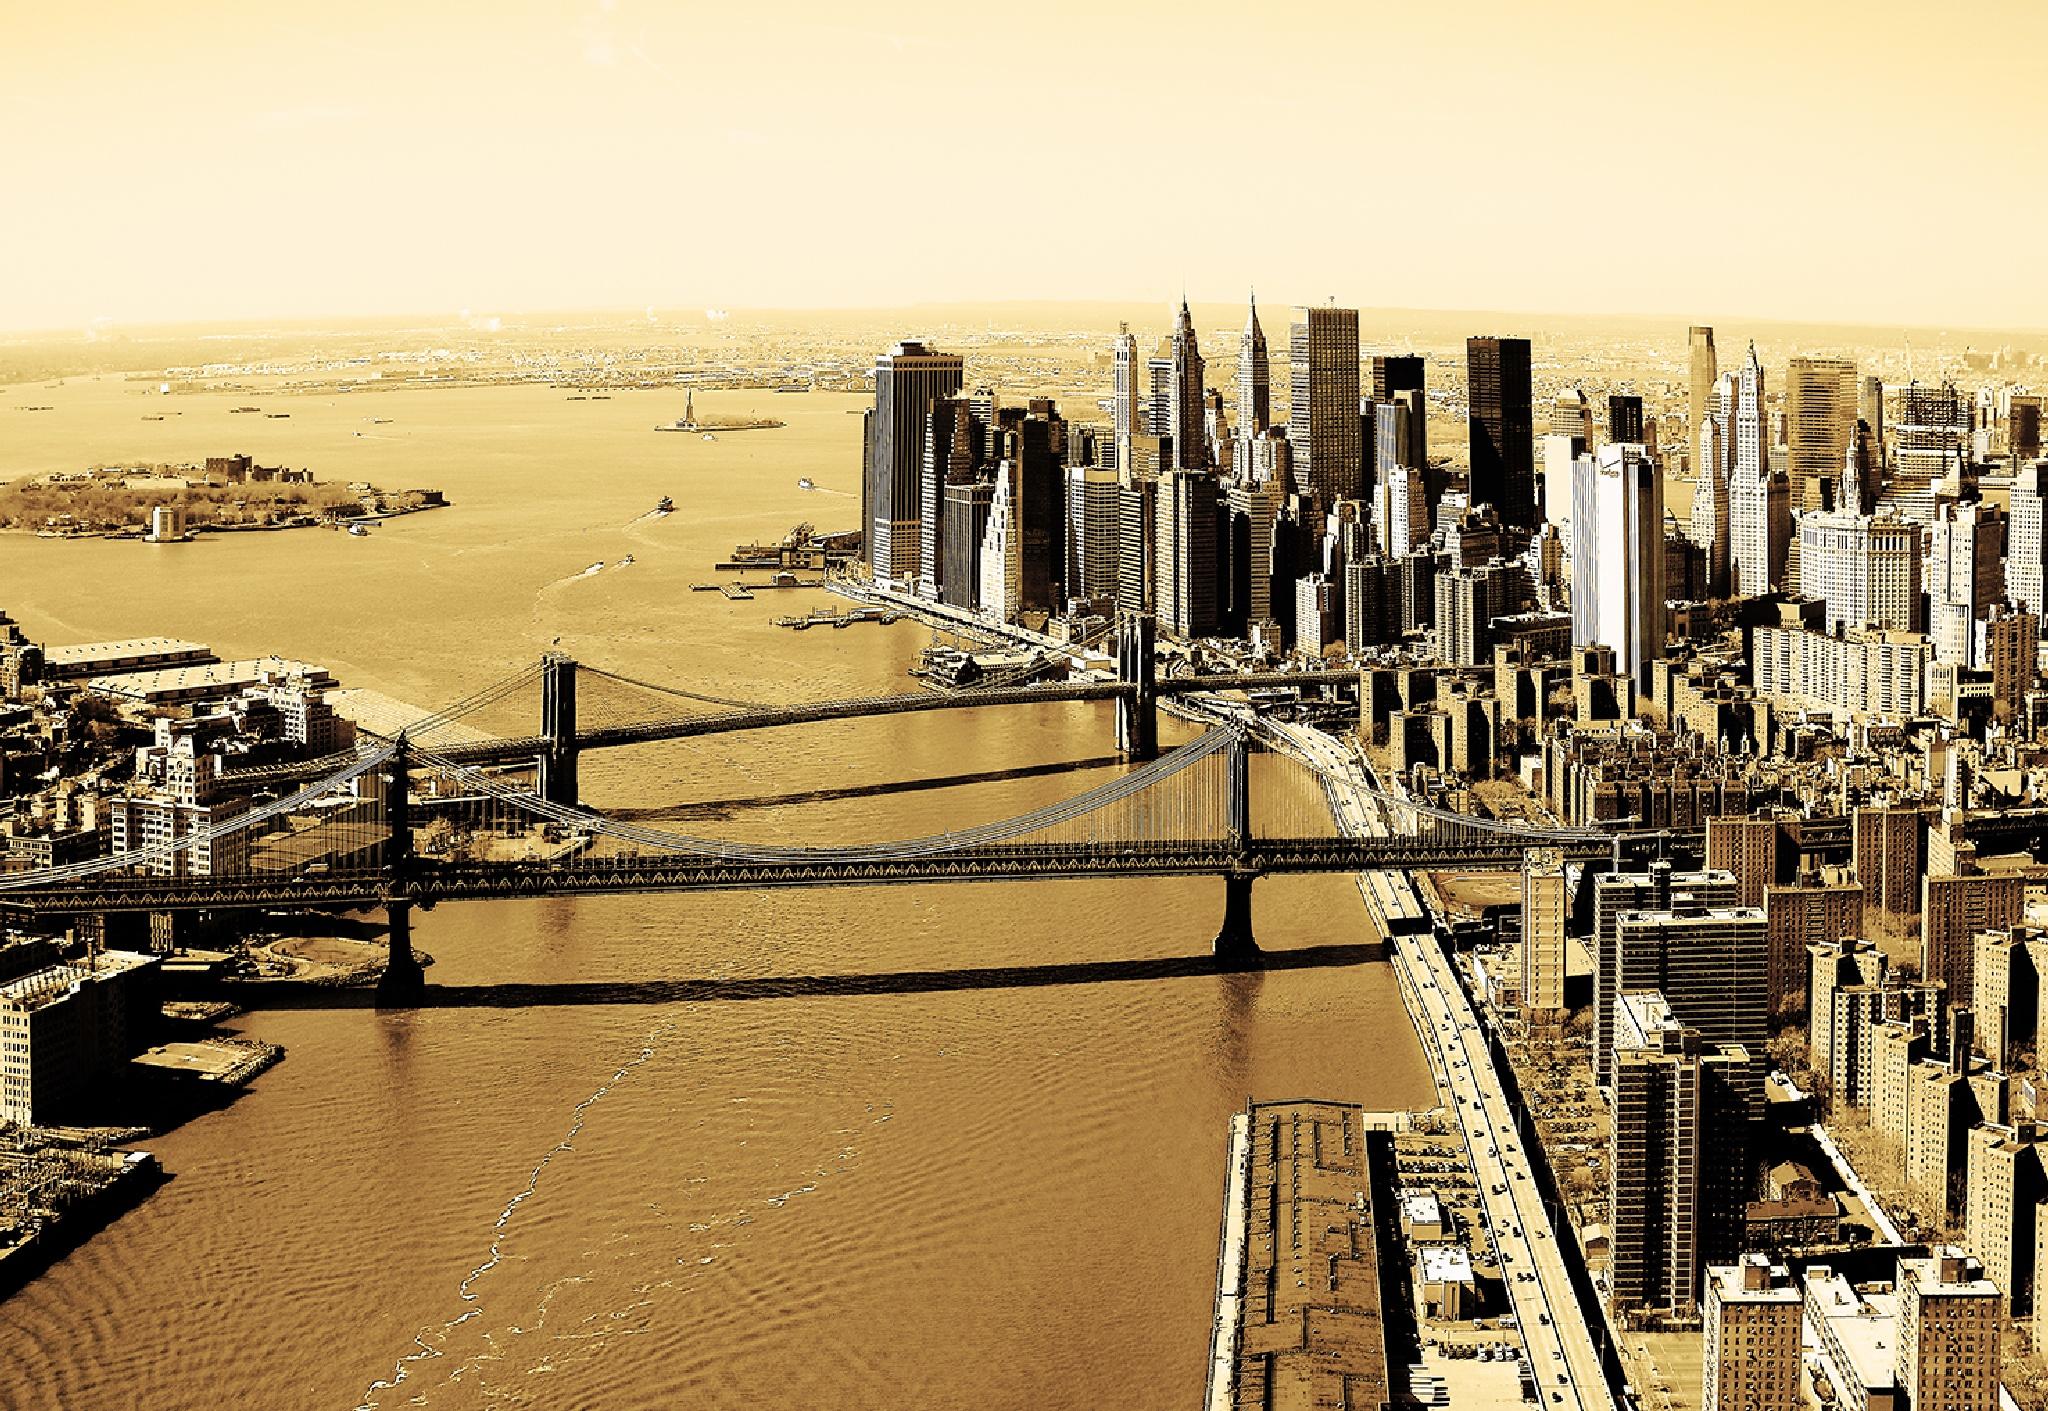 New York New York by Max Waldecker